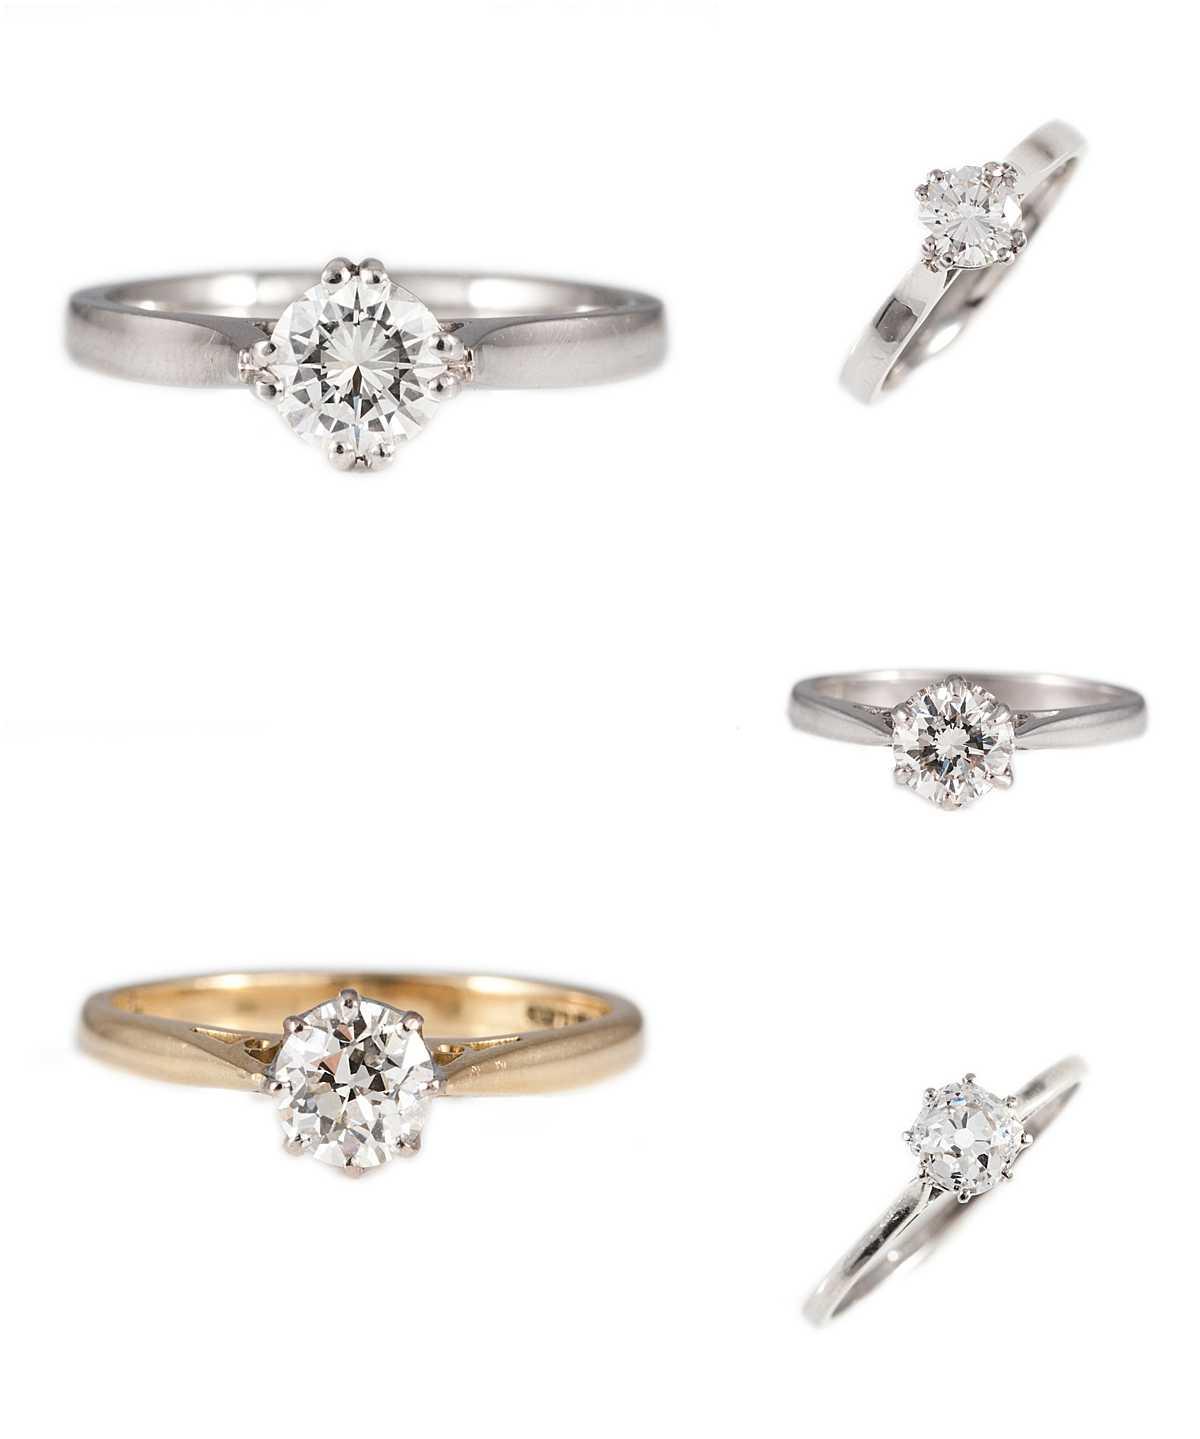 Classic Engagement Rings - Wedding Photography Edinburgh